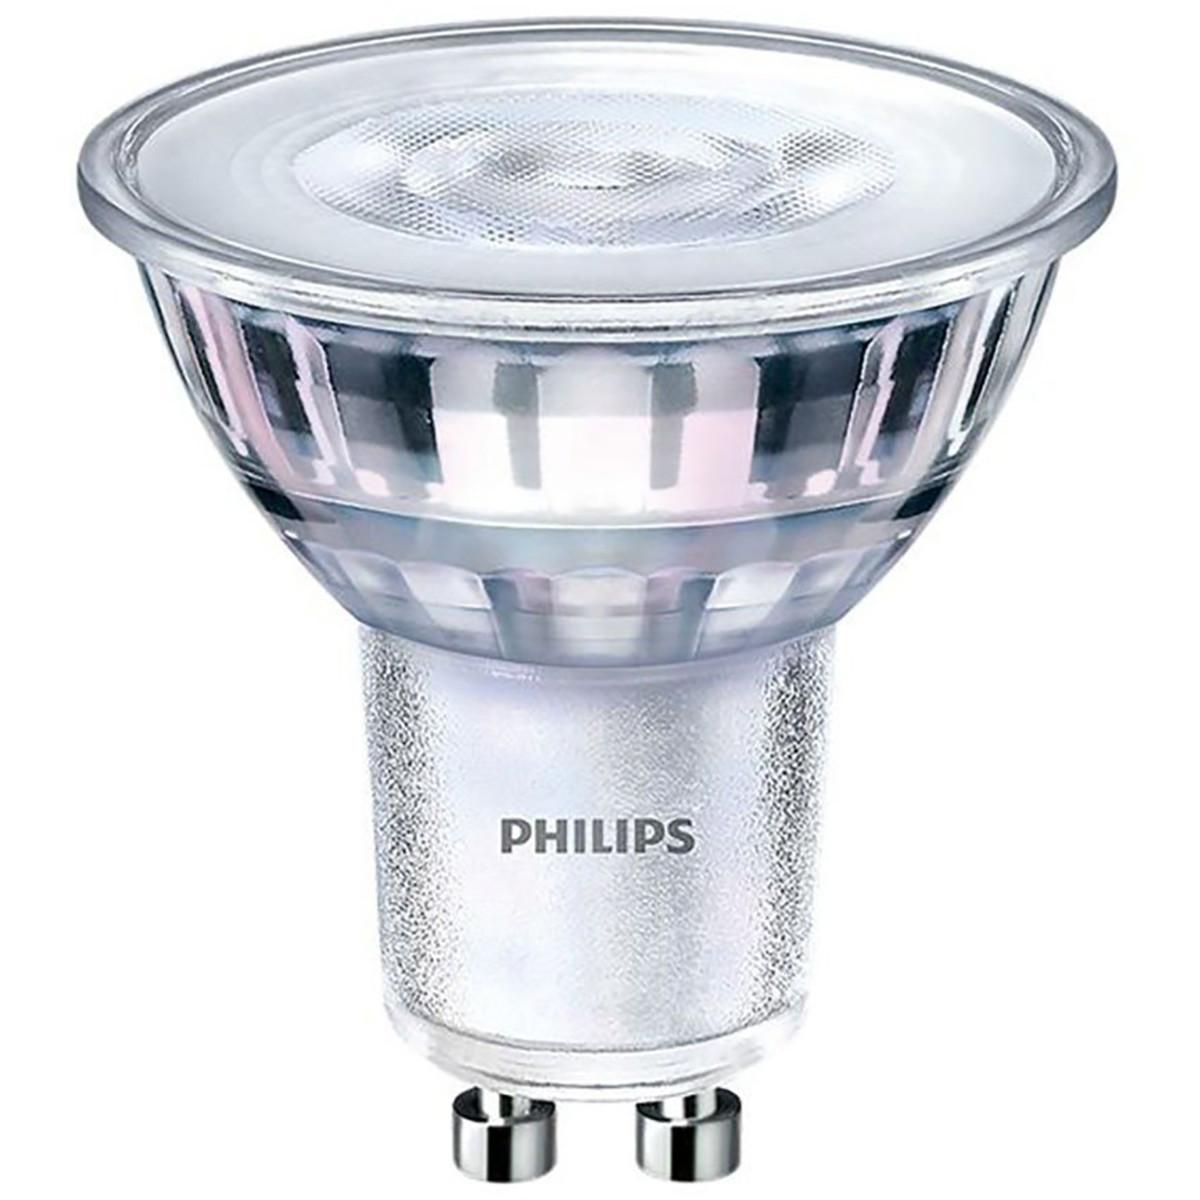 PHILIPS - LED Spot - SceneSwitch 827 36D - GU10 Fitting - Dimbaar - 1.5W-5W - Warm Wit 2200K-2700K |